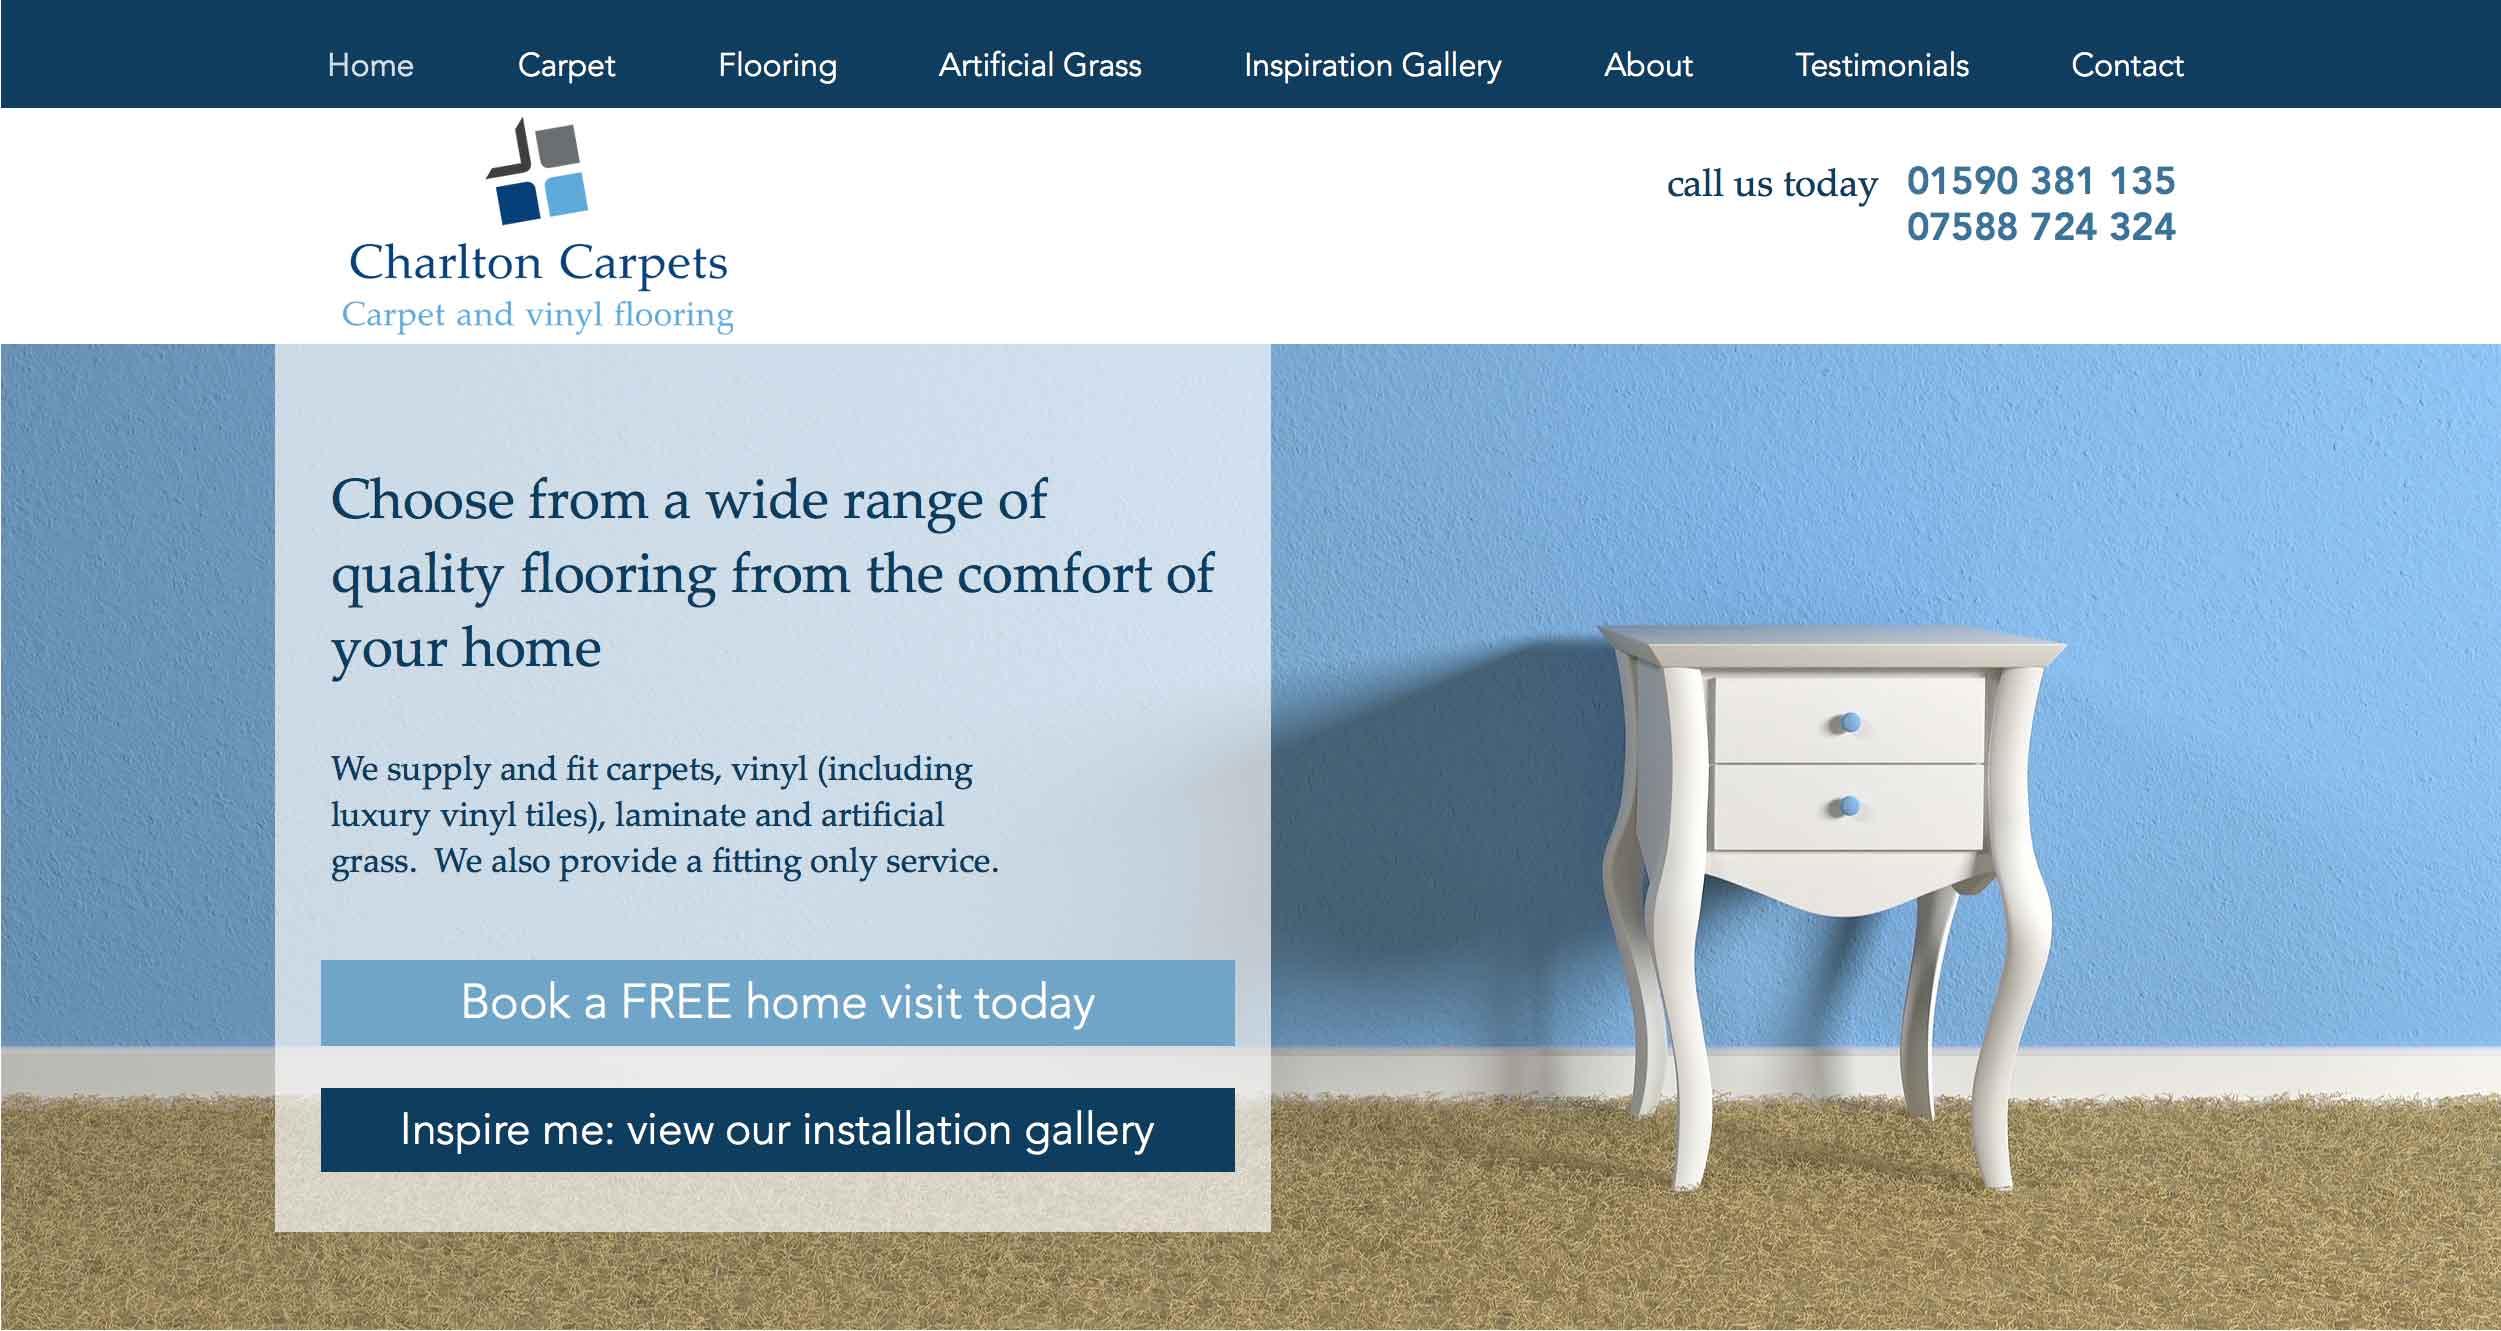 website design in blues